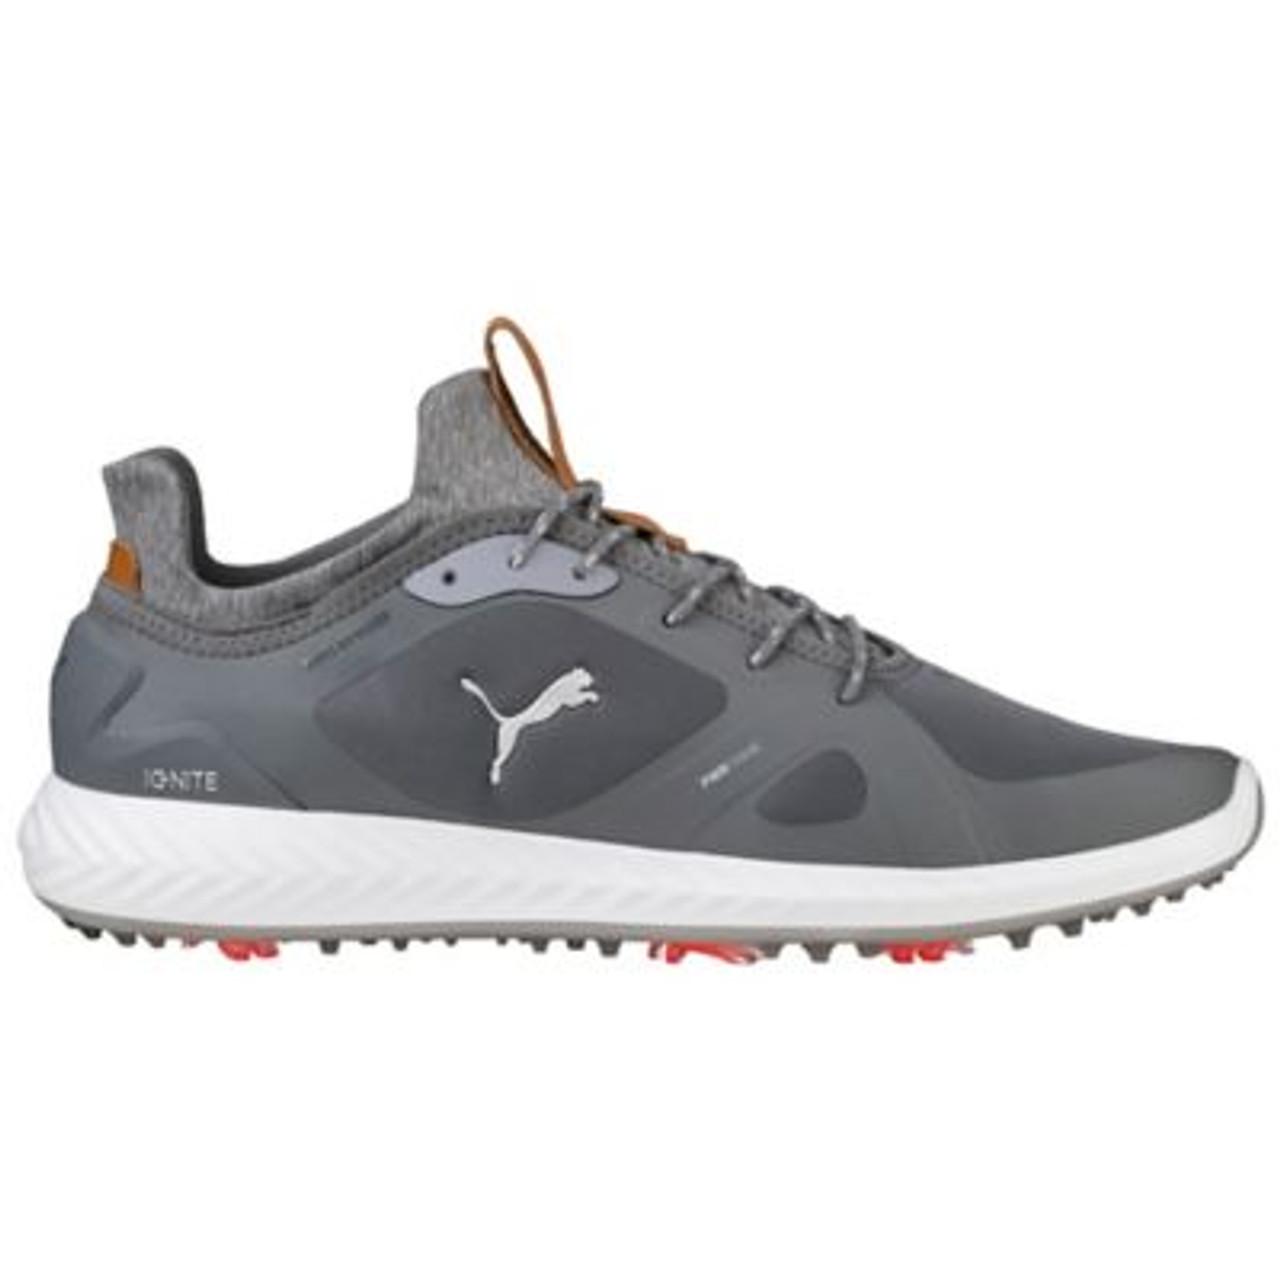 Puma Ignite PWRadapt WD Shoes Quite Shade